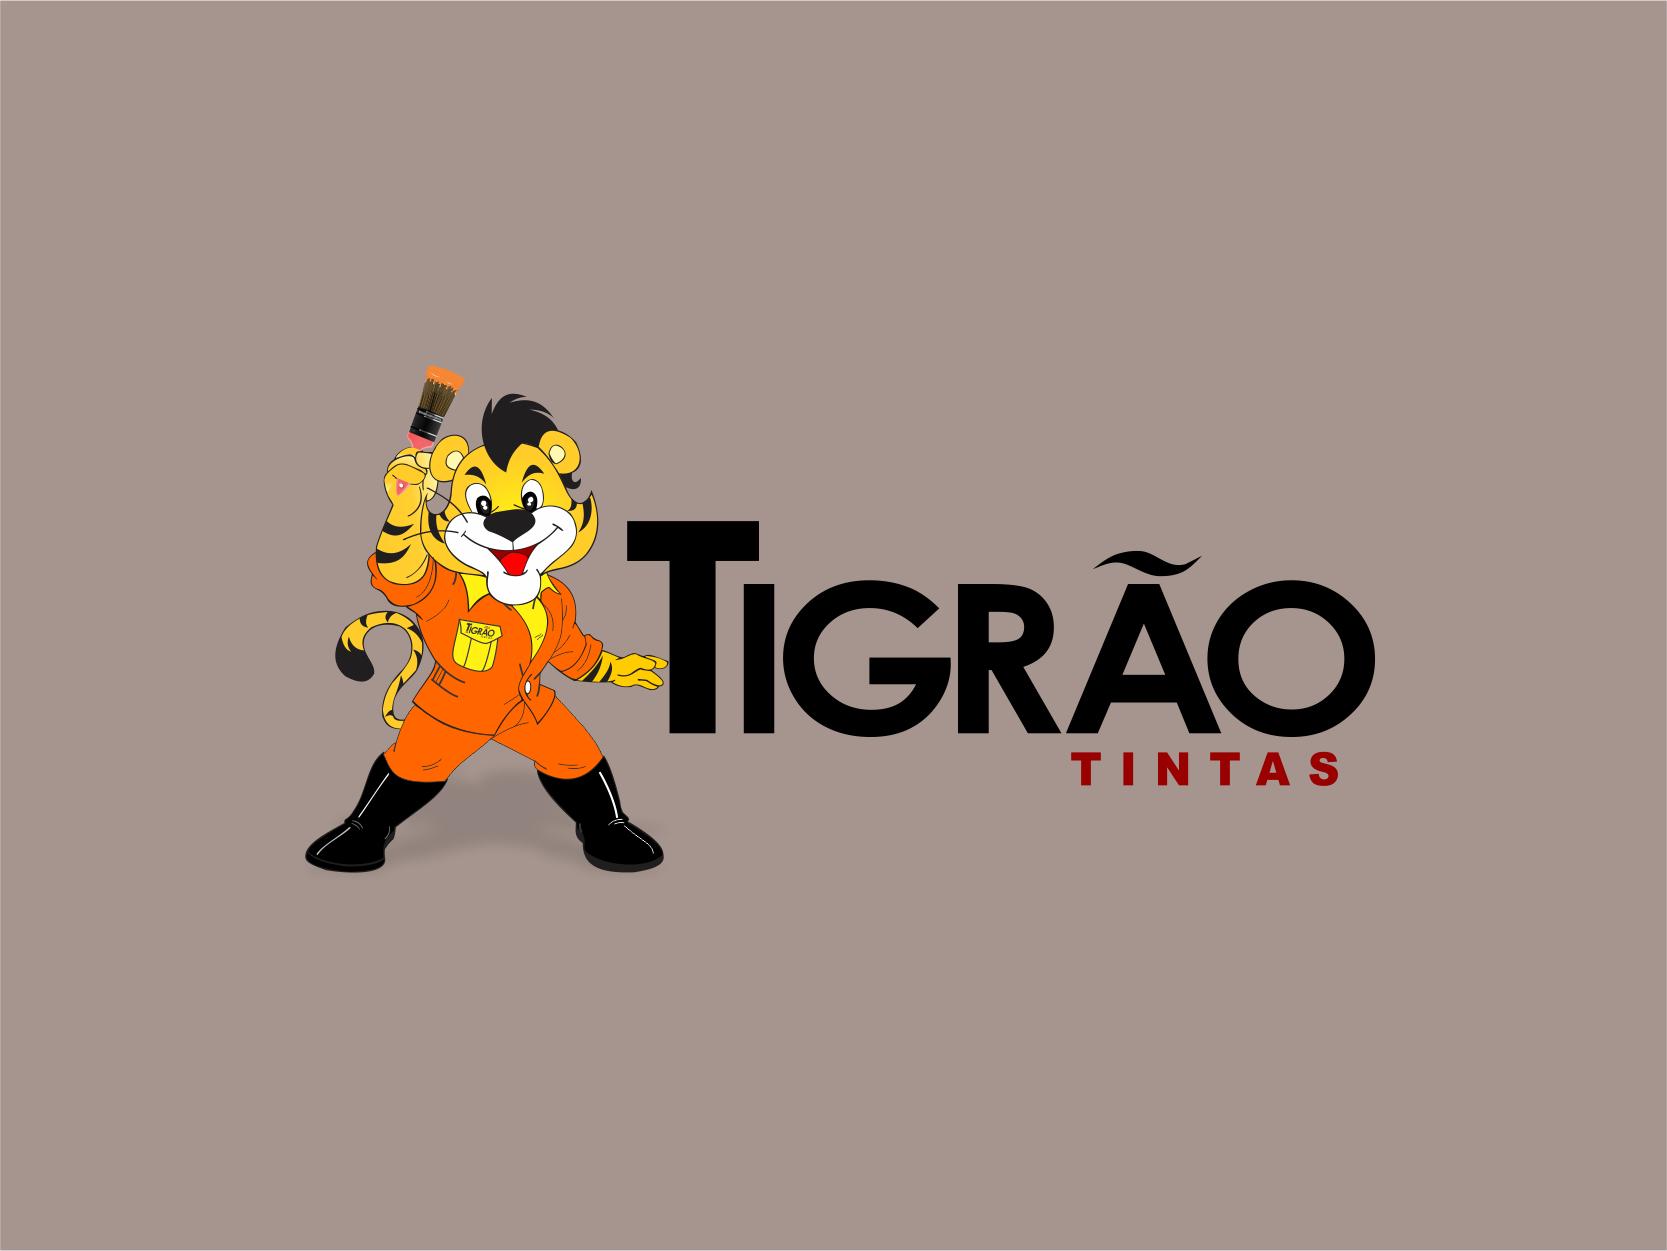 Tigrão Tintas